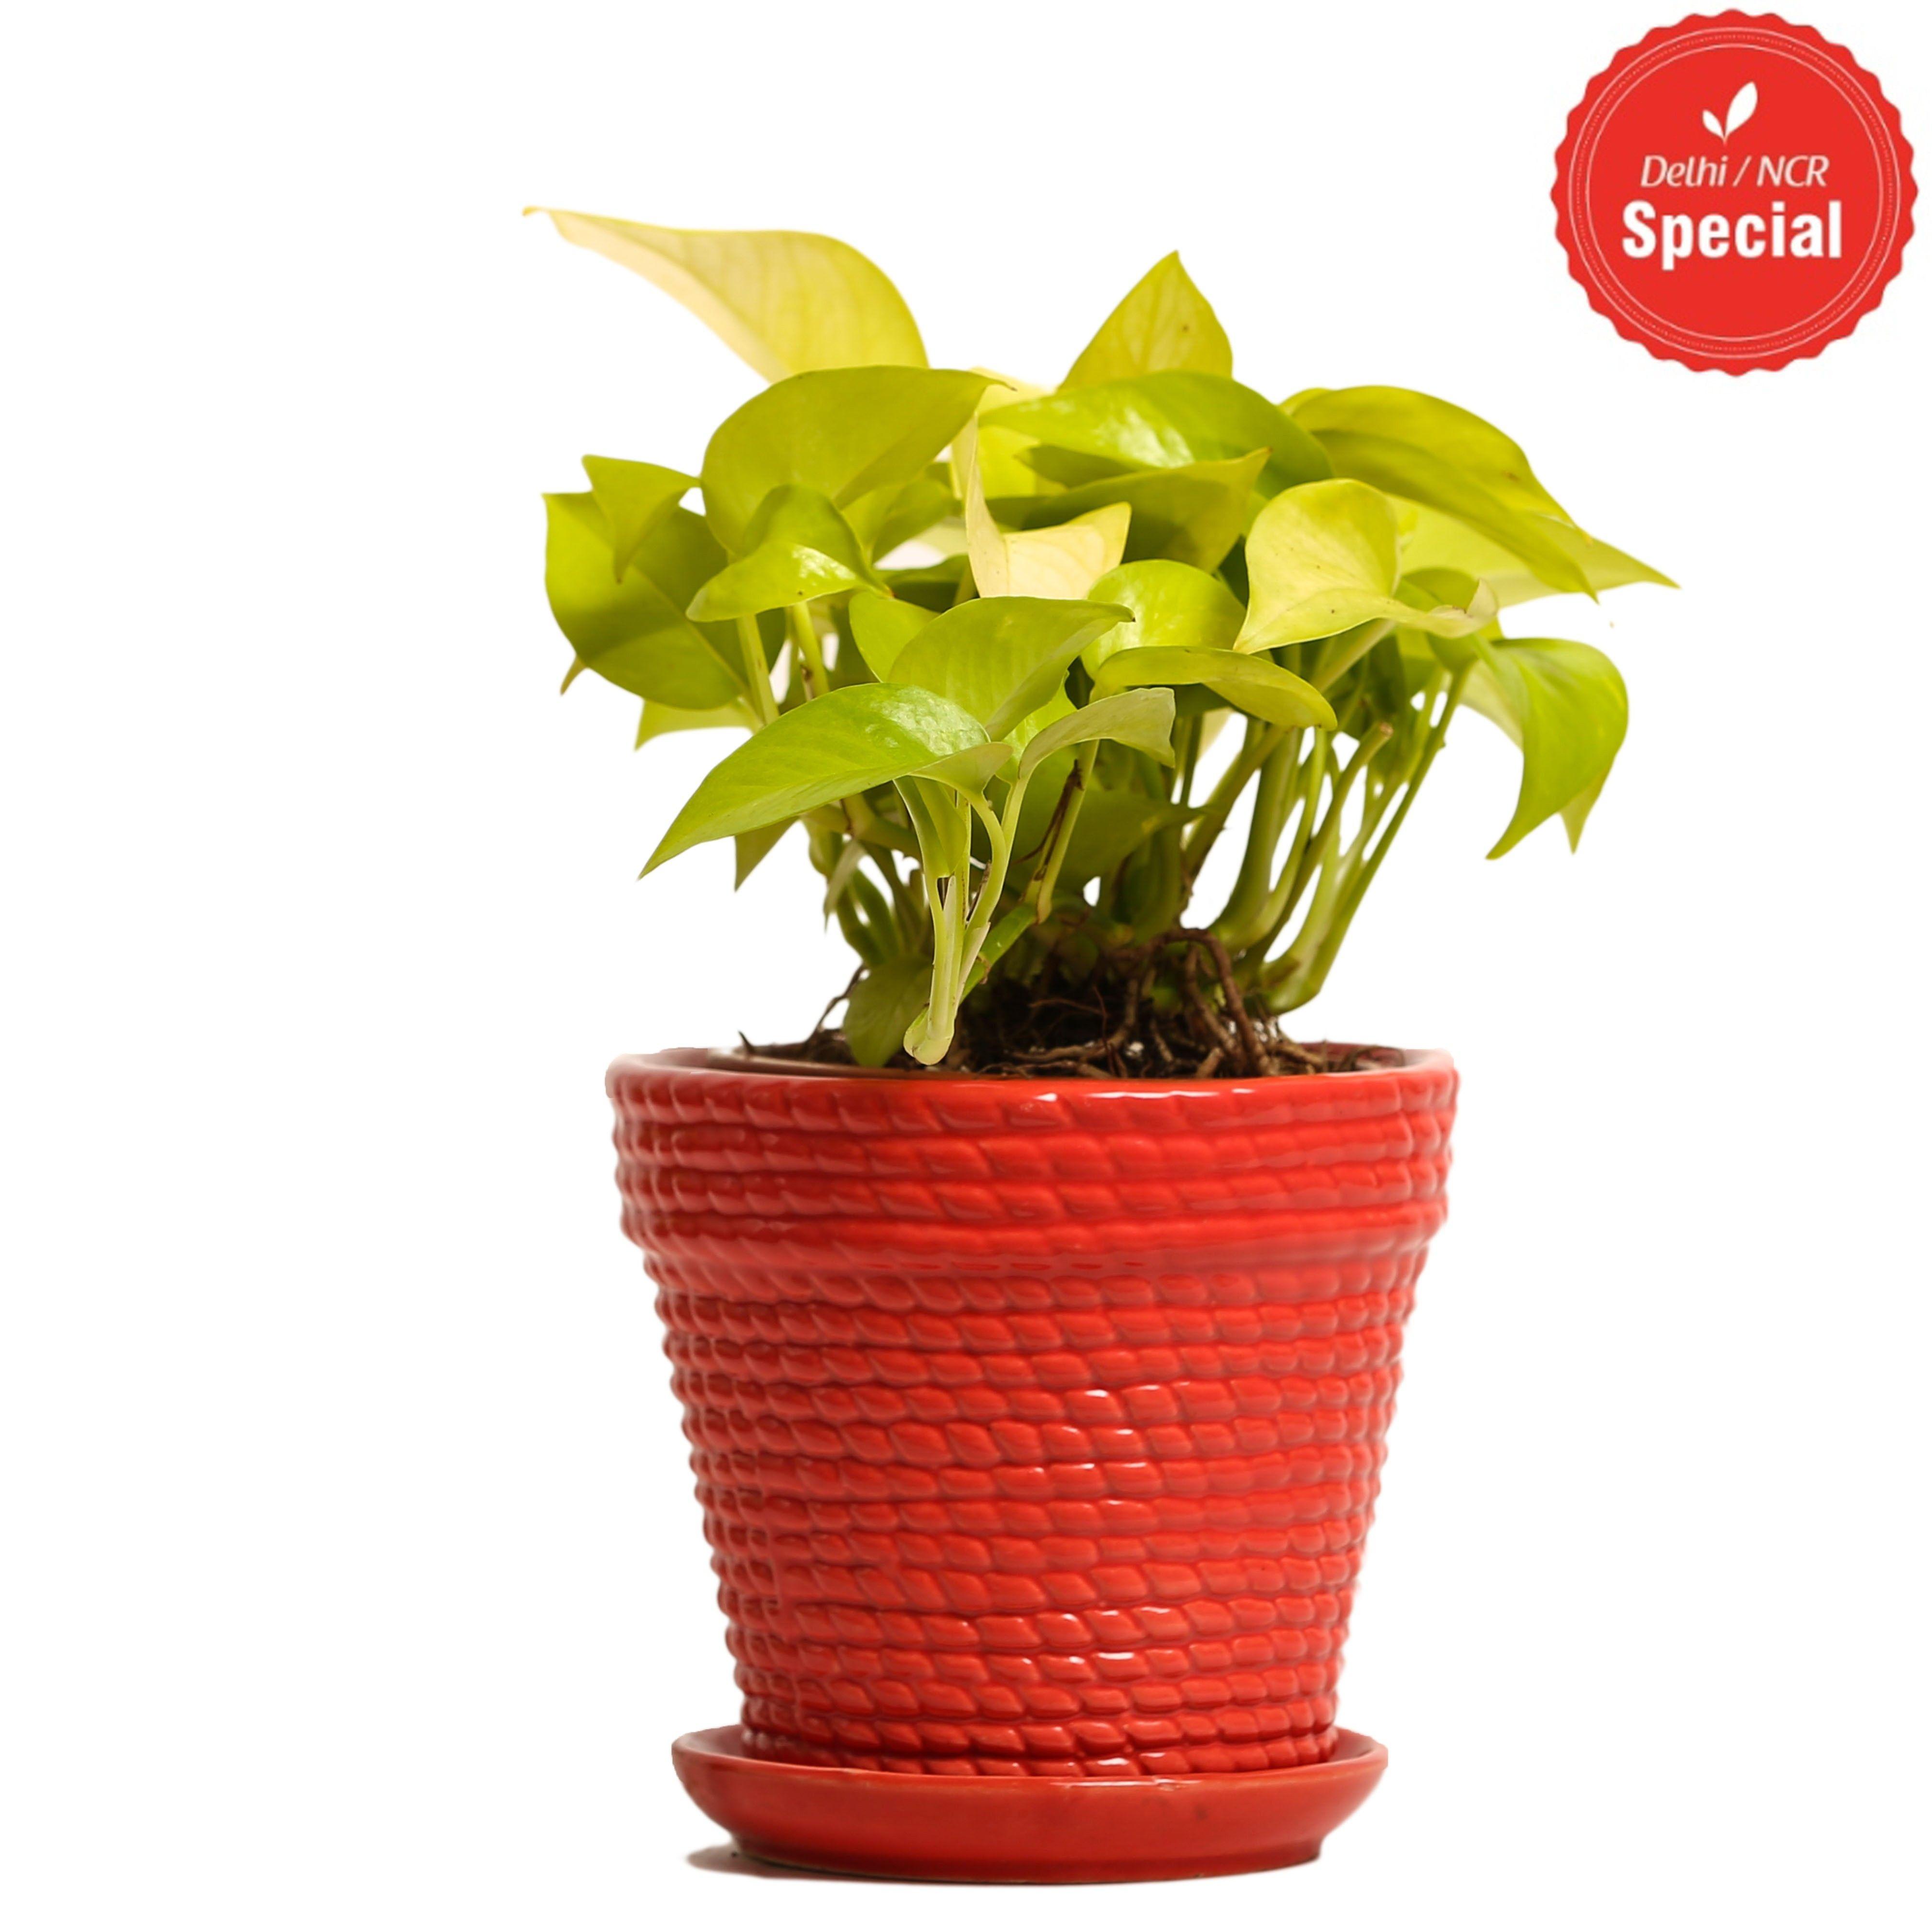 NG- Indoor Plant Golden Pothos Red Ceramic Pot